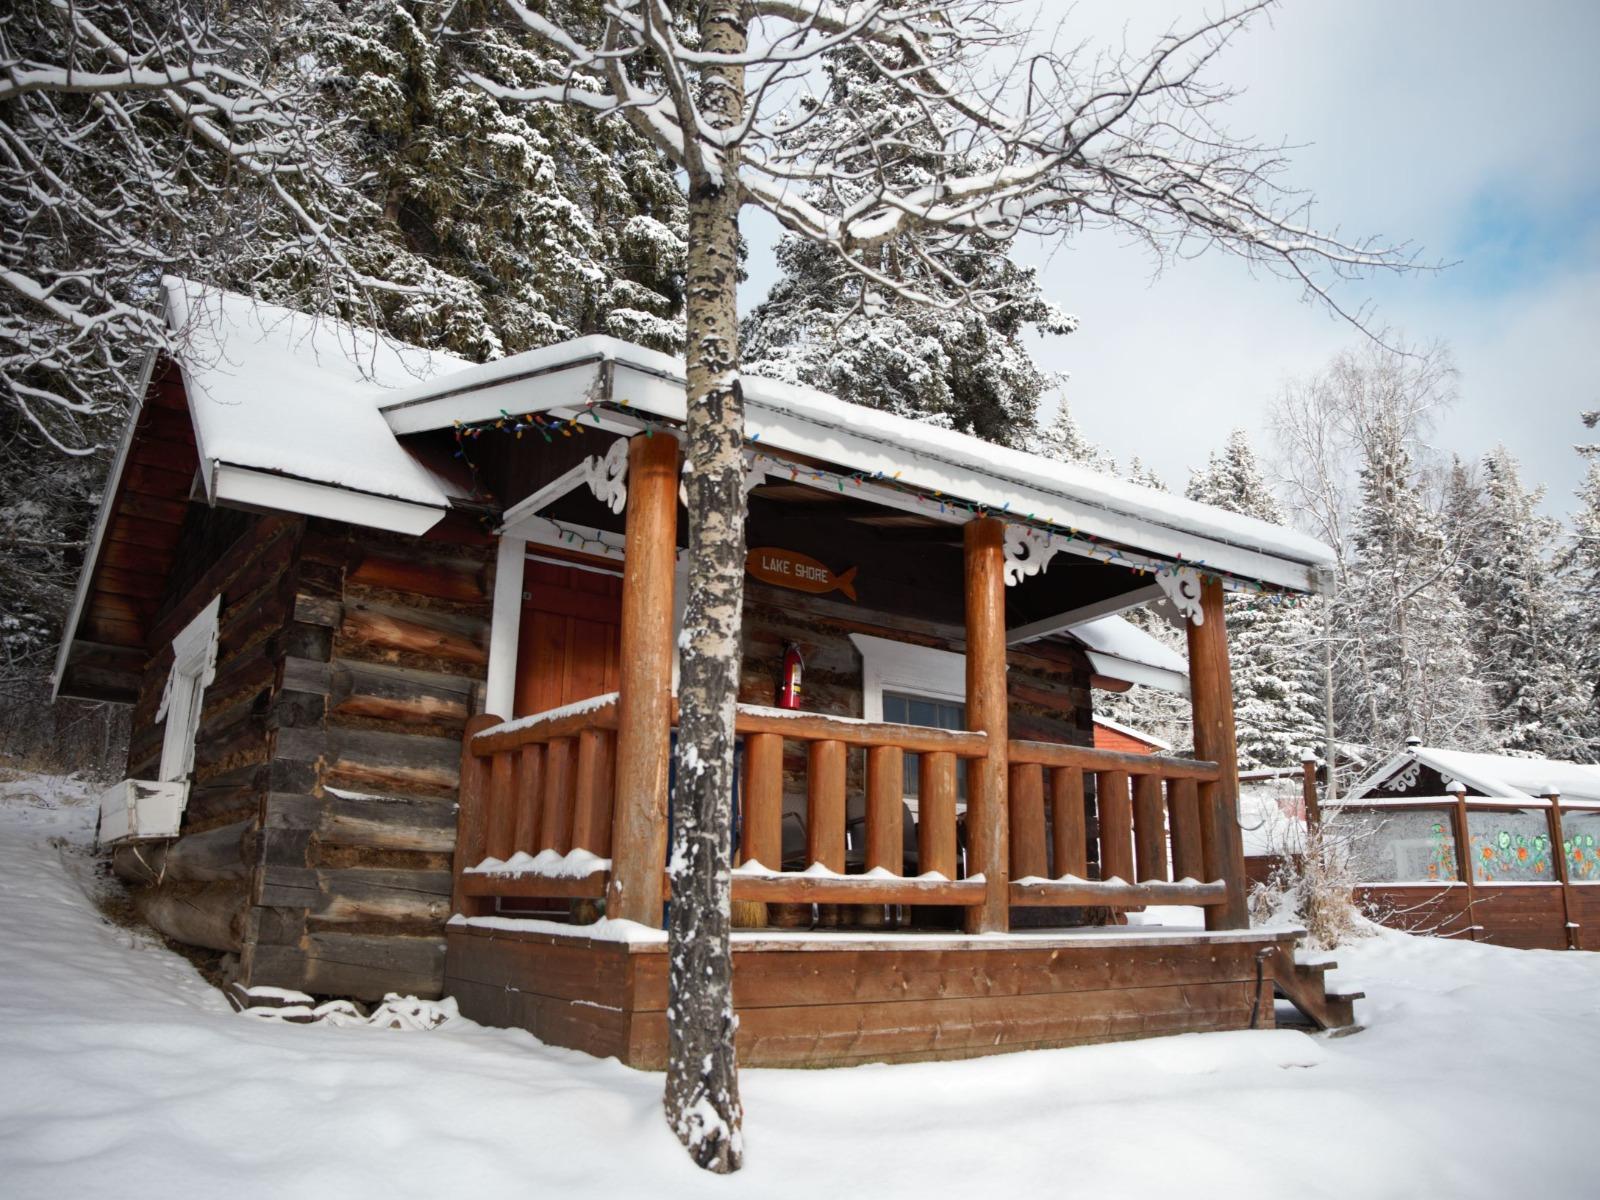 Knouff Lake Wilderness Resort